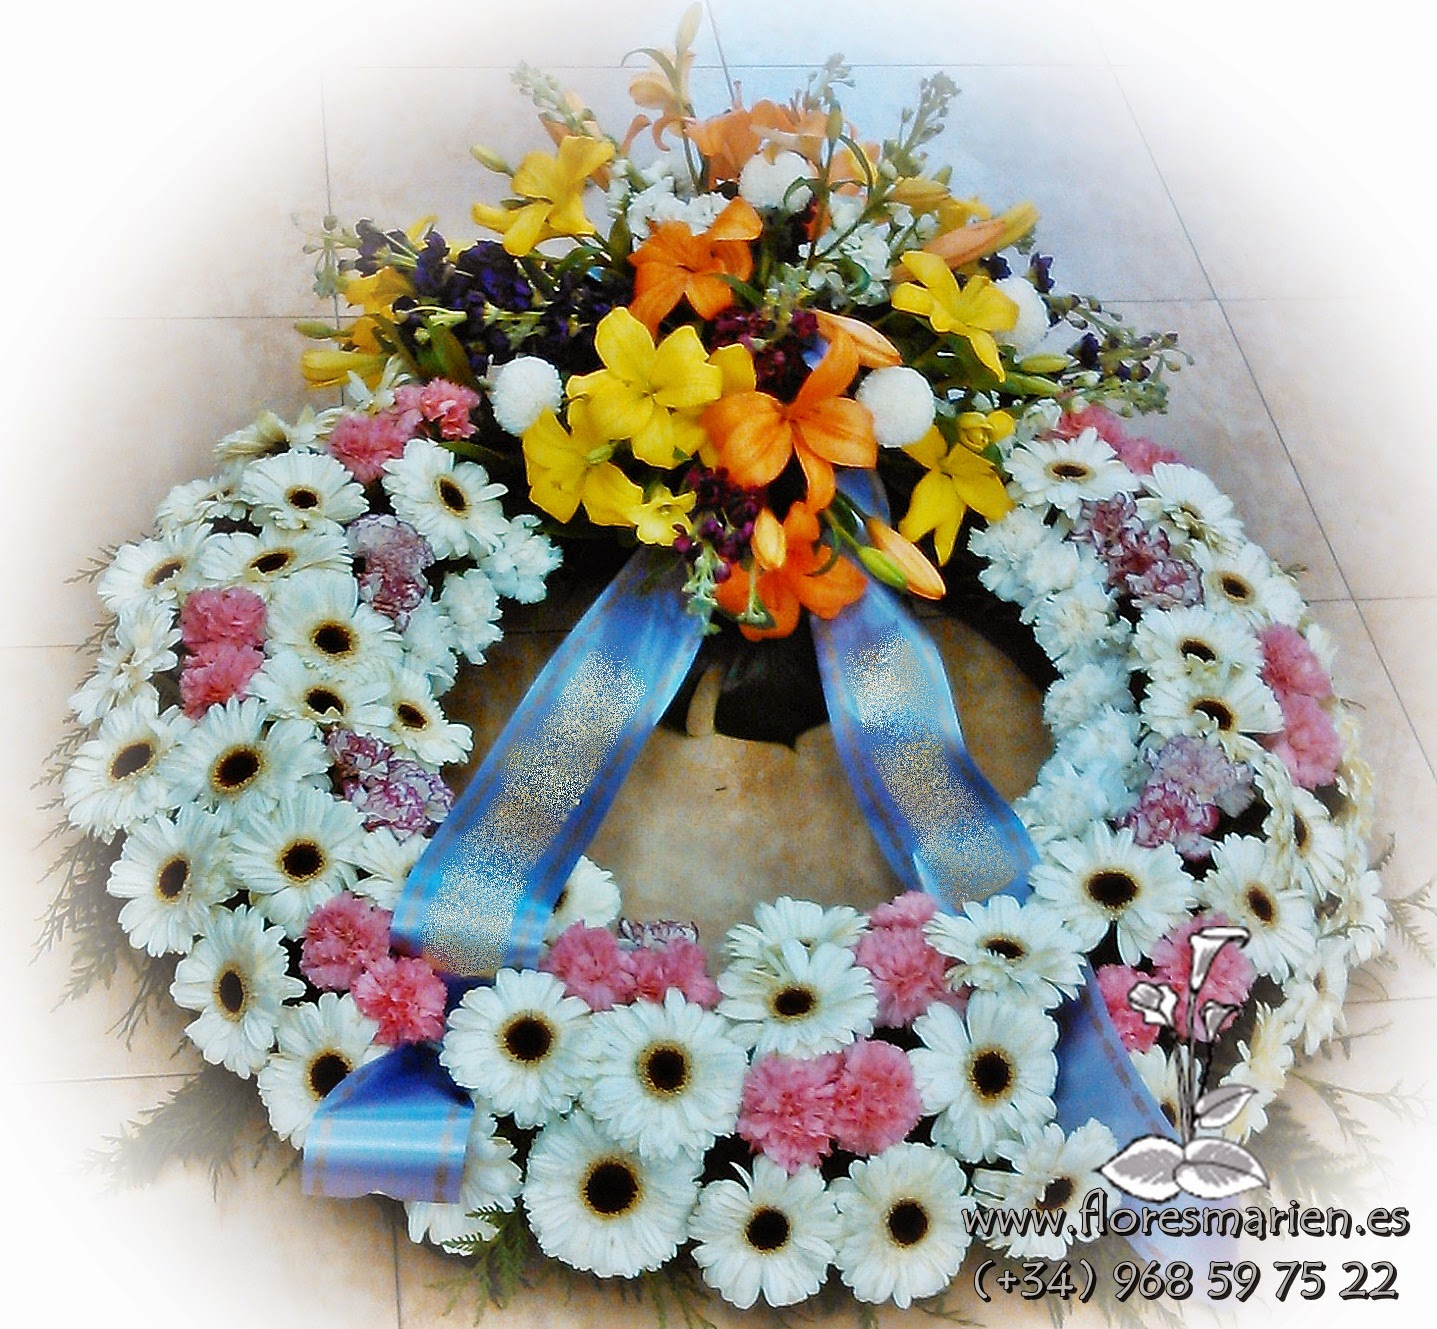 http://floresmarien.es/Funerarios